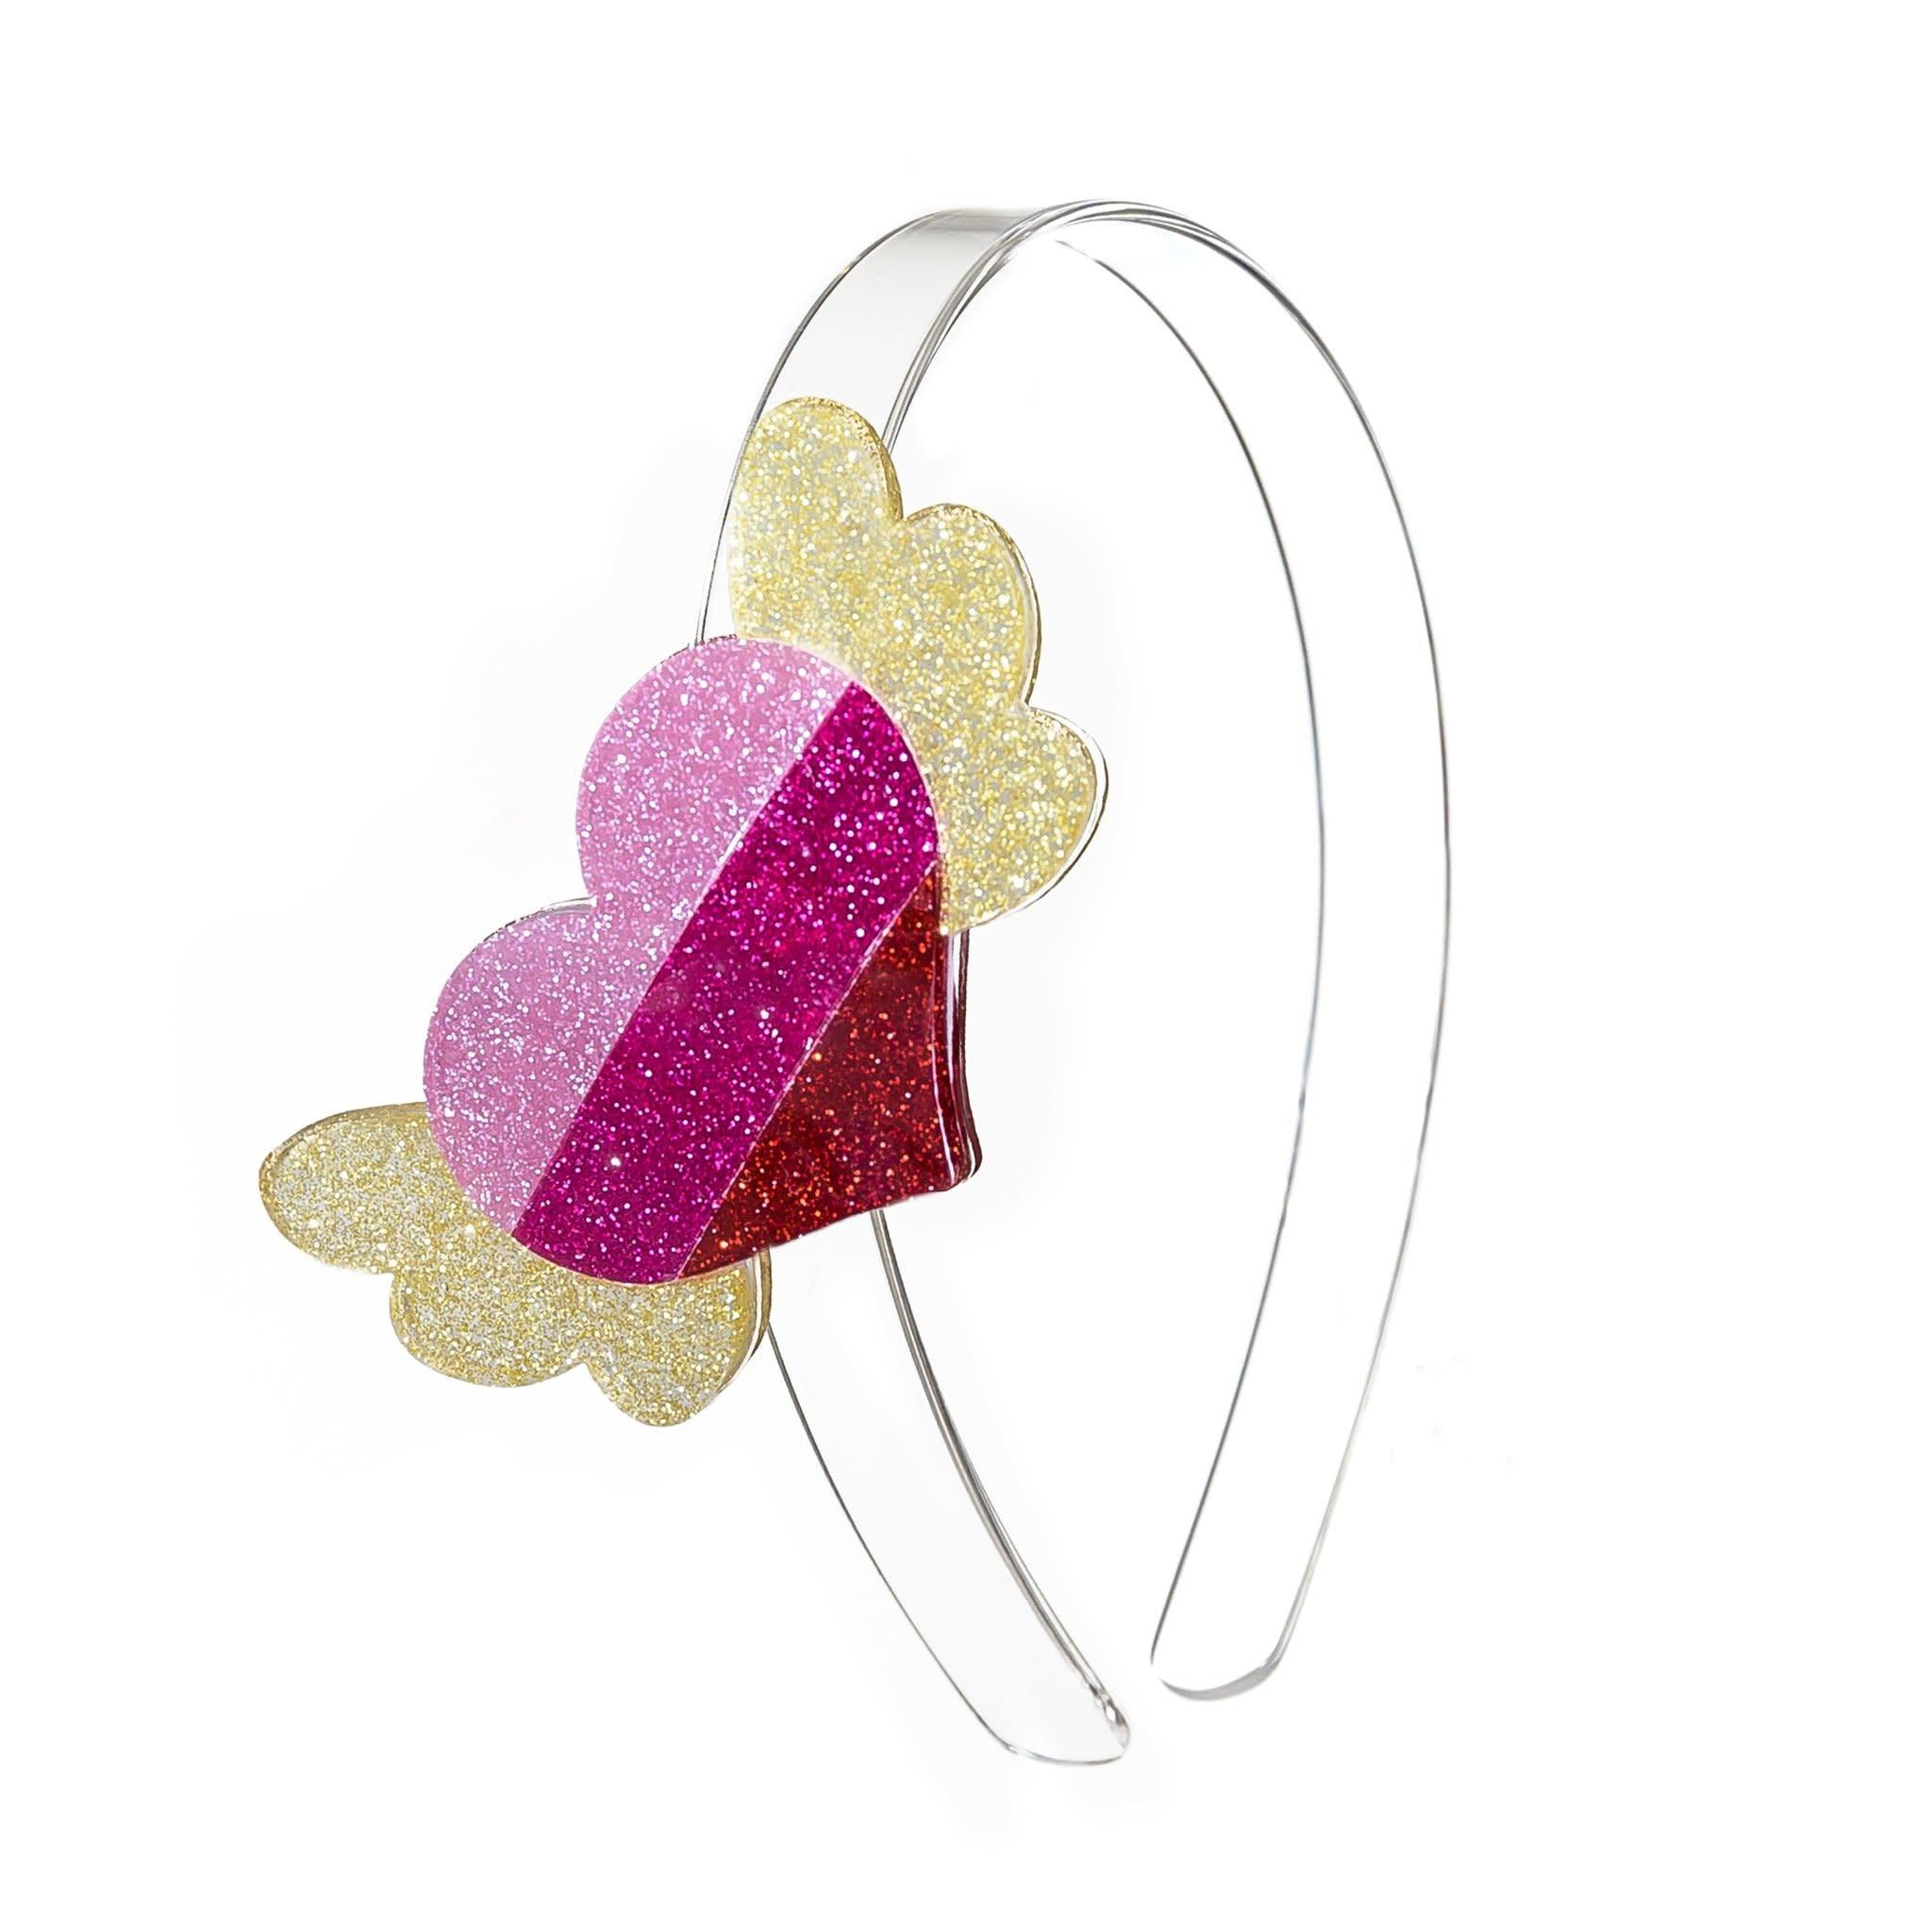 lilies&roses Winged Heart Headband